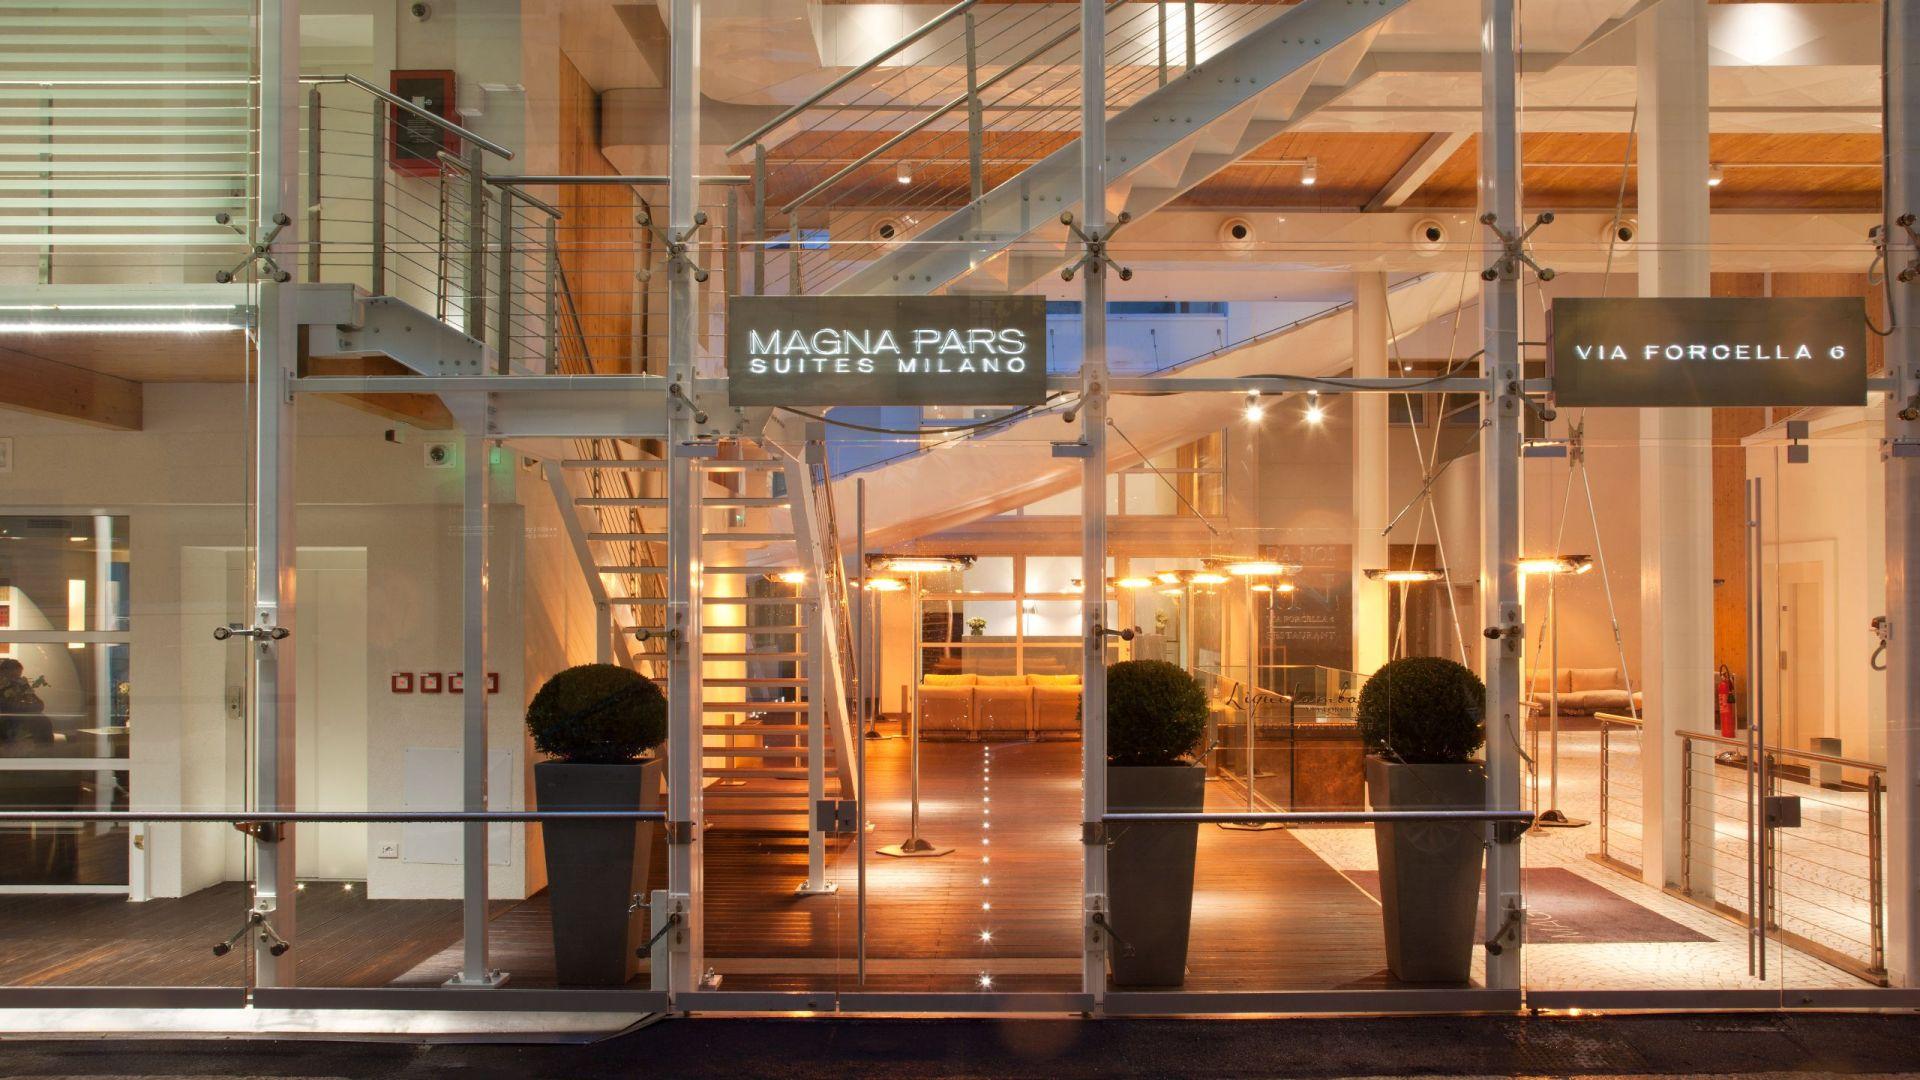 Hotel Magna Pars Suites Milano entrance